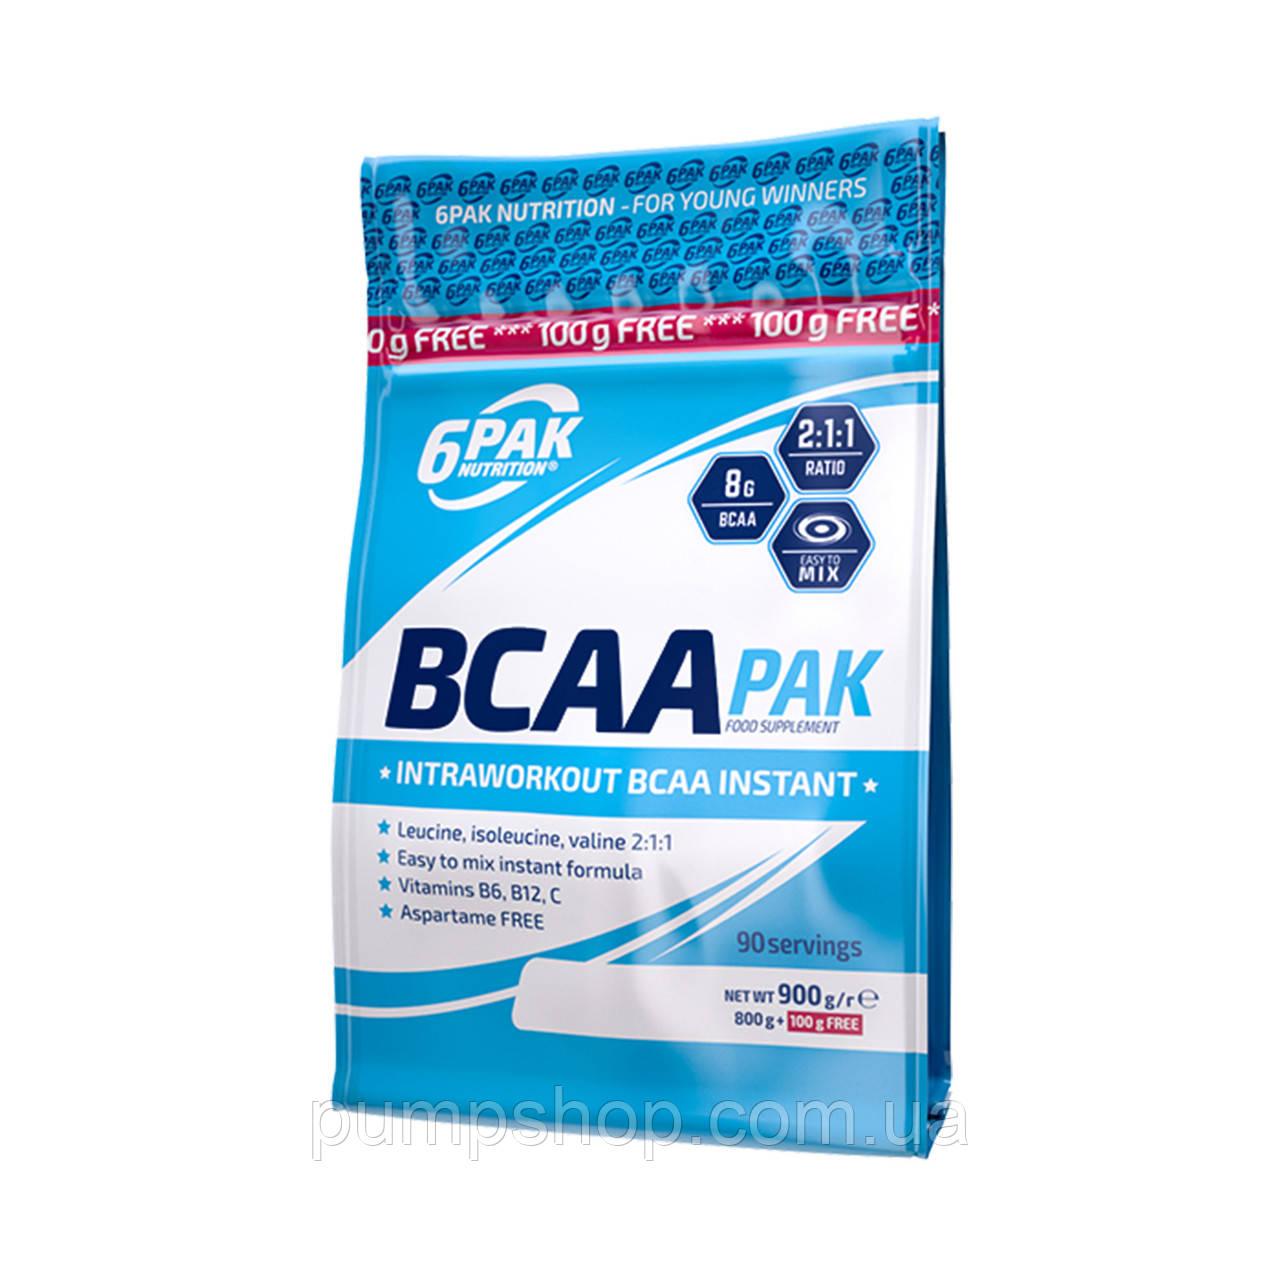 Амінокислоти бца 6PAK Nutrition AMINO PAK 2:1:1 Instant 900 г